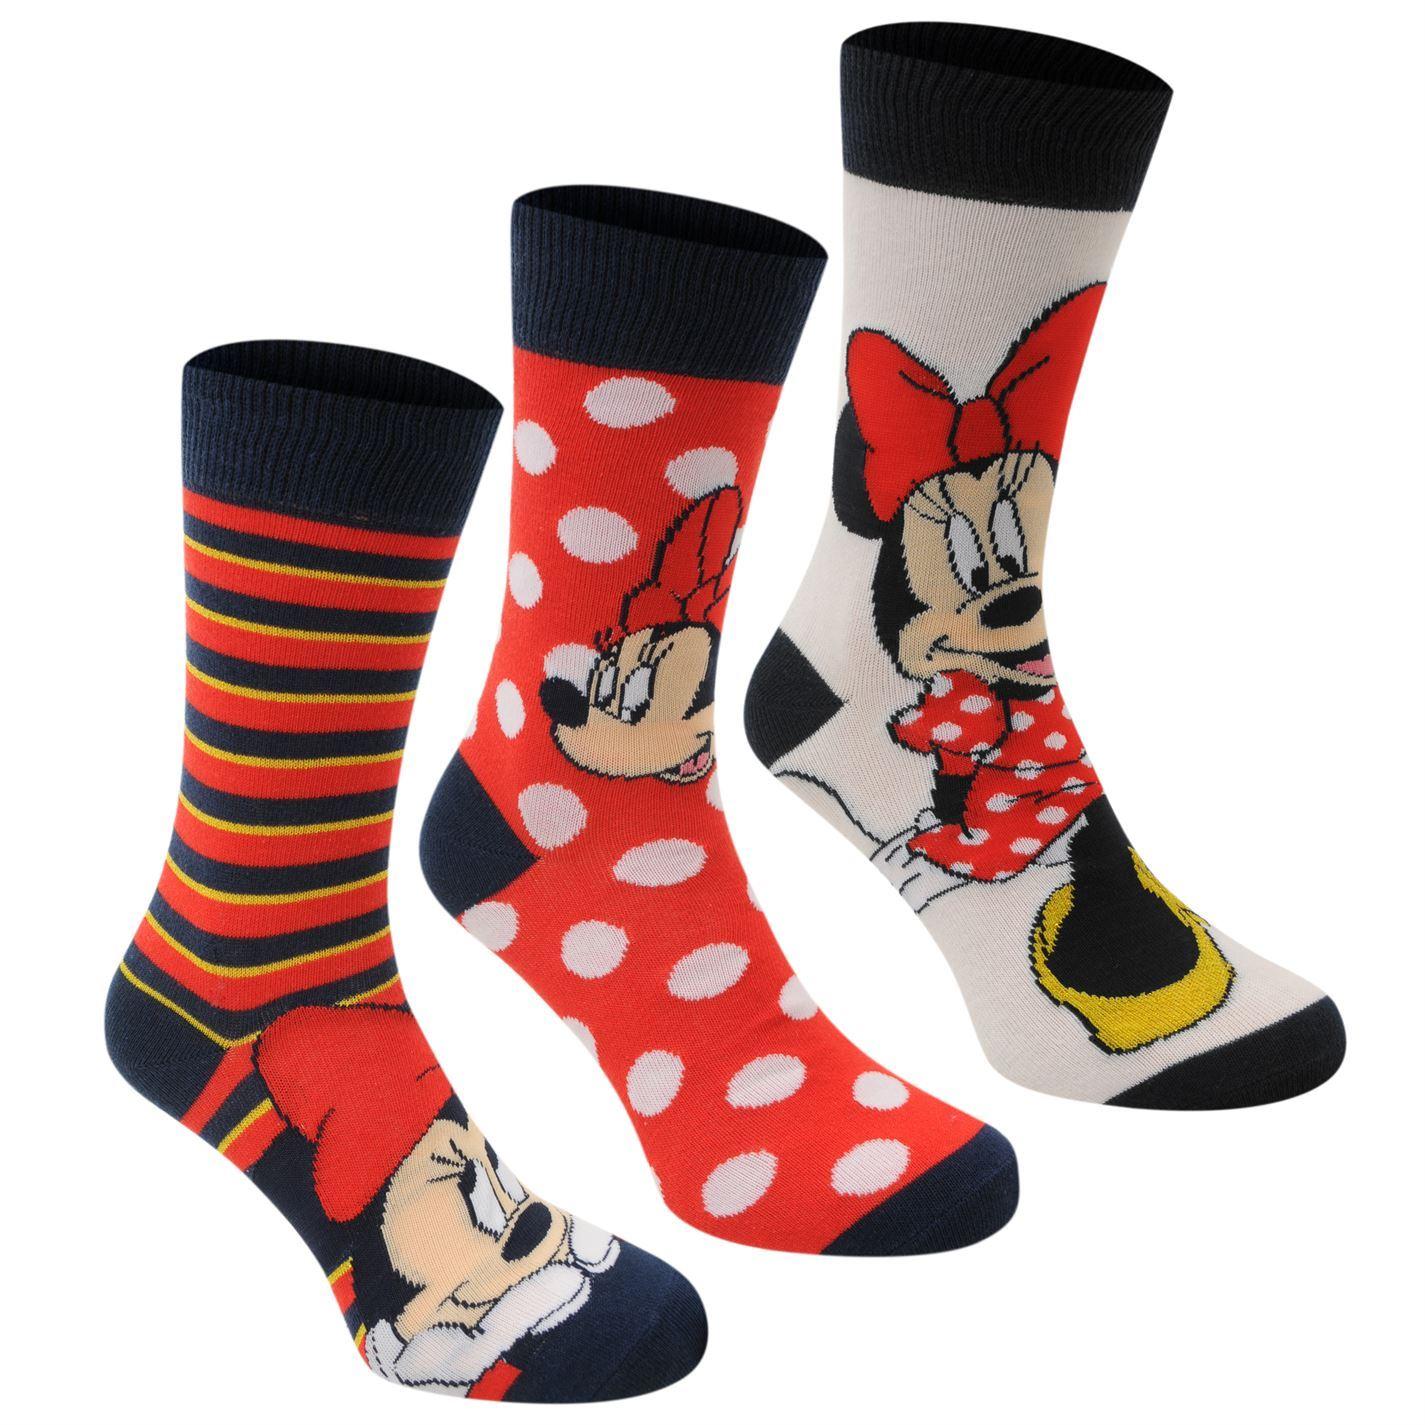 Disney Minnie Mouse Crew Socks 3 Pack Womens Black/Red ...